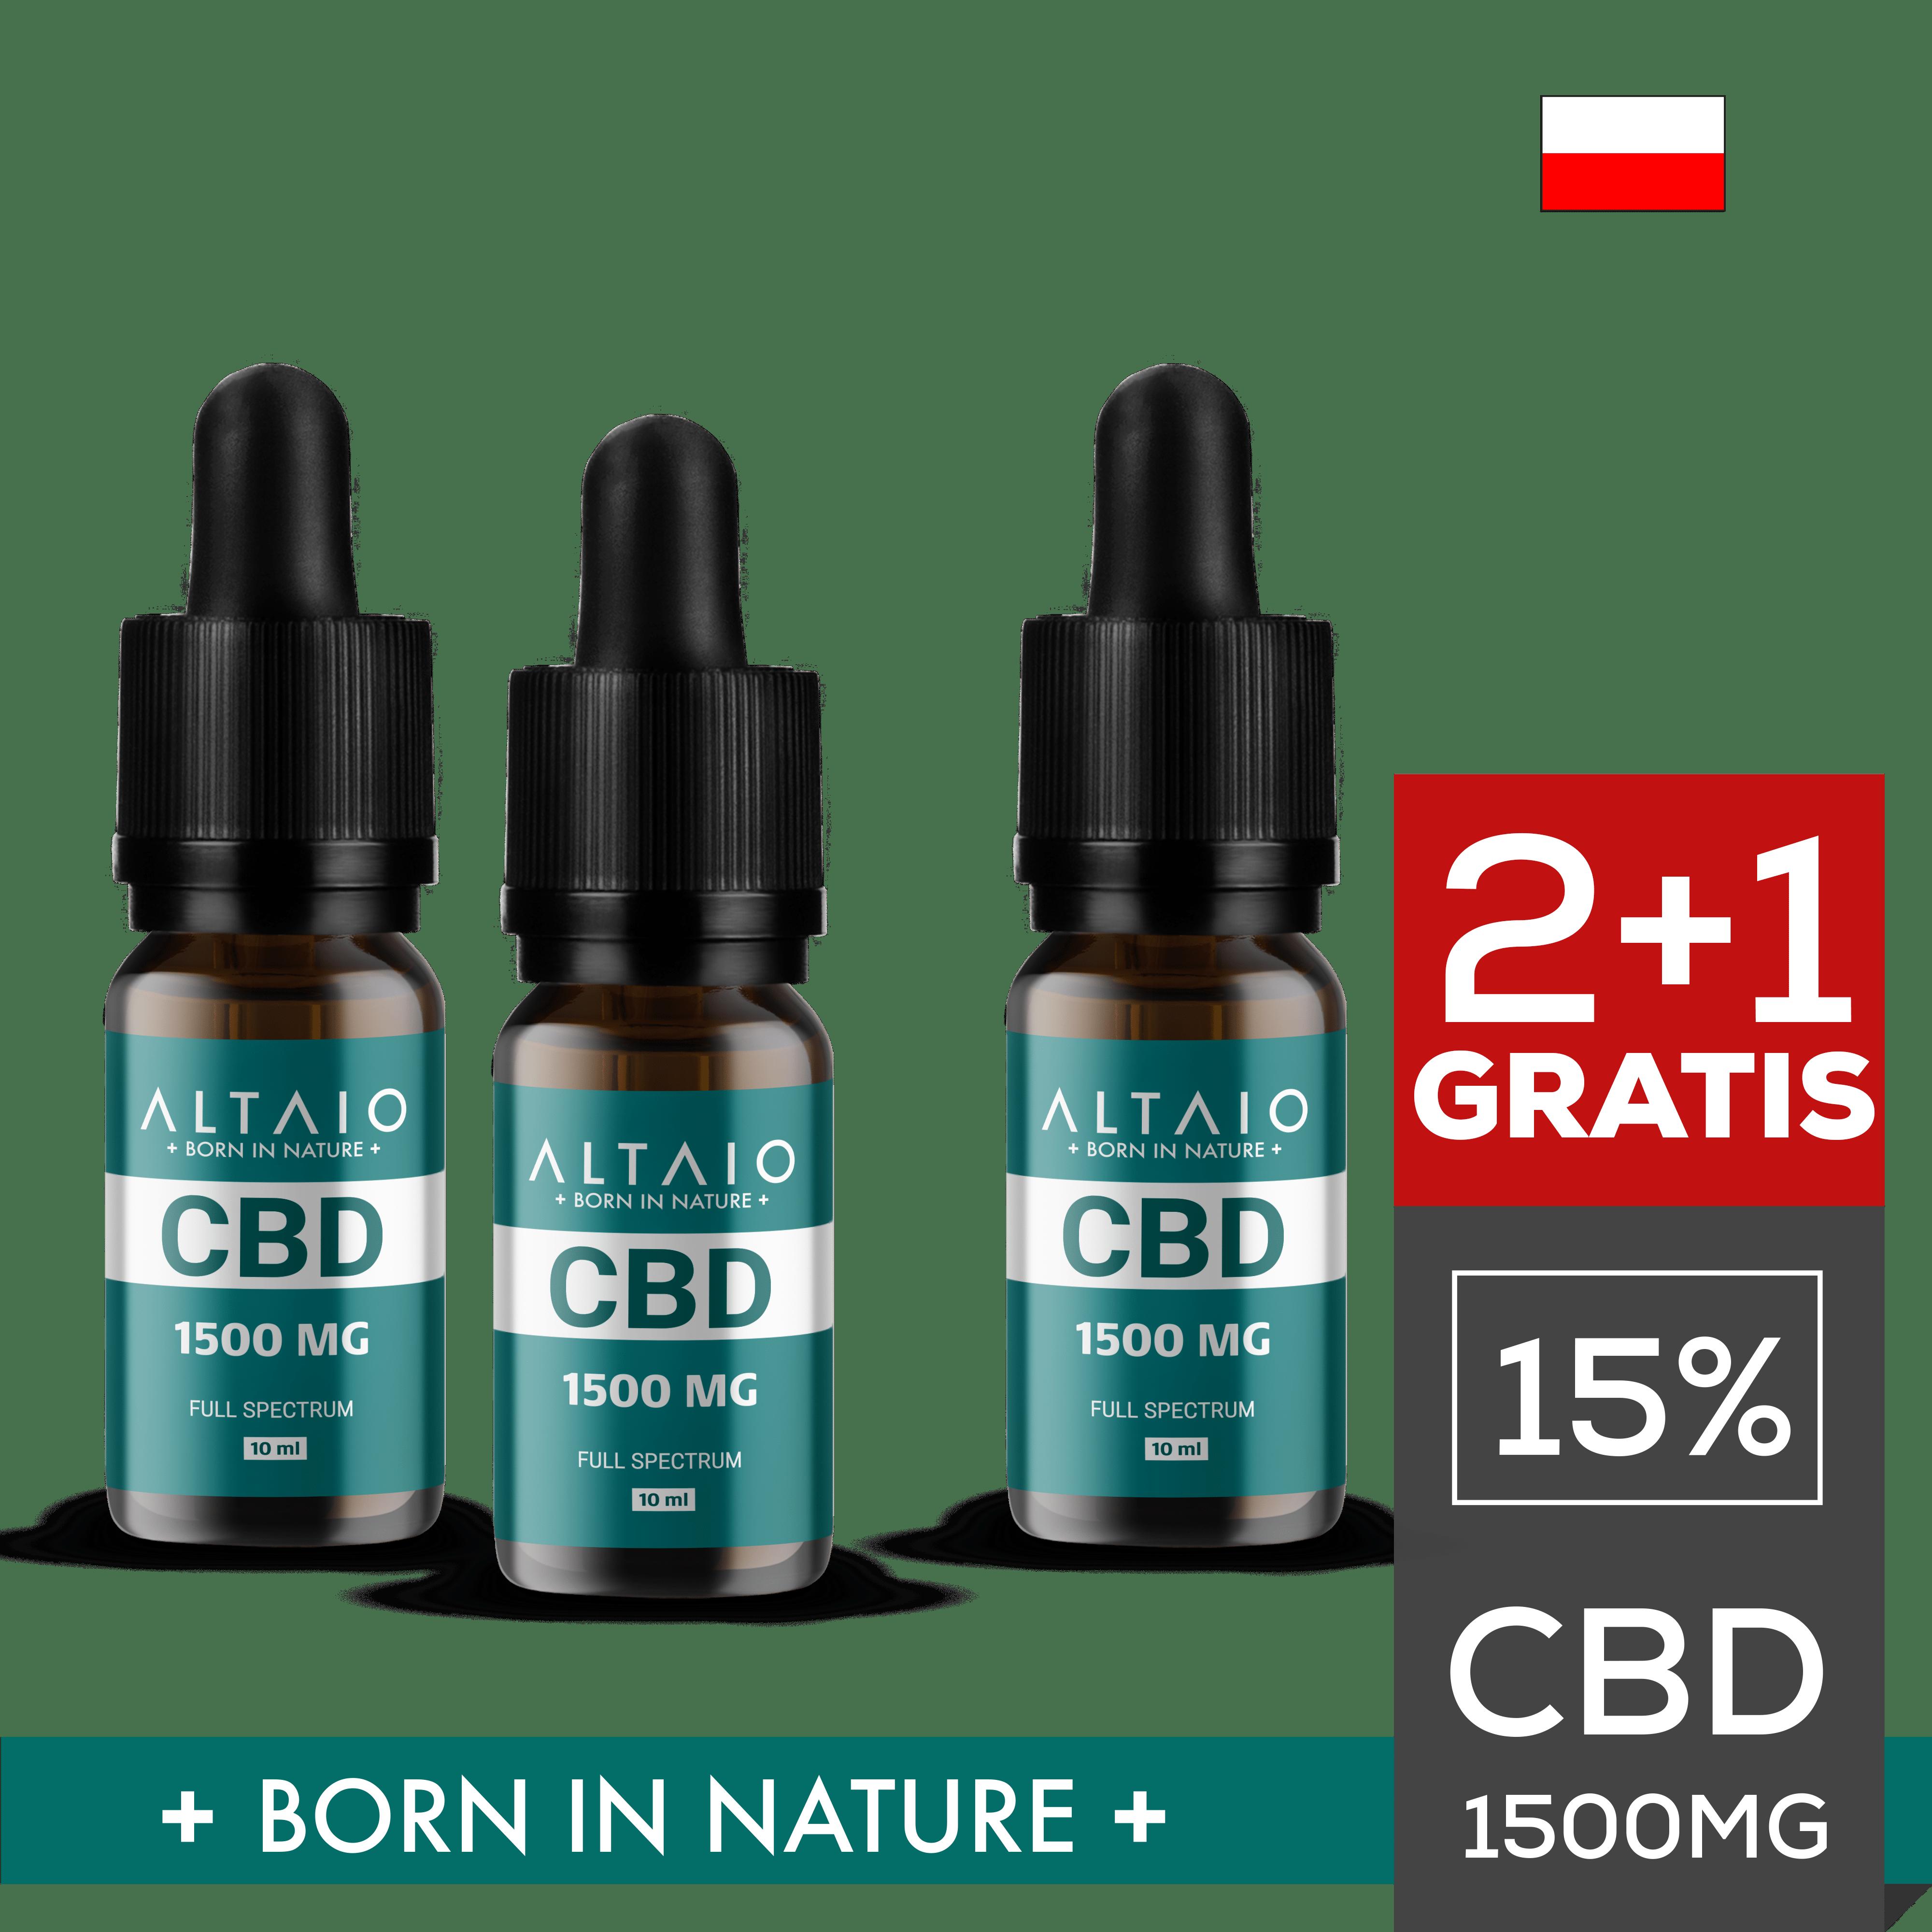 ZESTAW 2+1 GRATIS ALTAIO olejek konopny CBD 1500 mg 10 ml